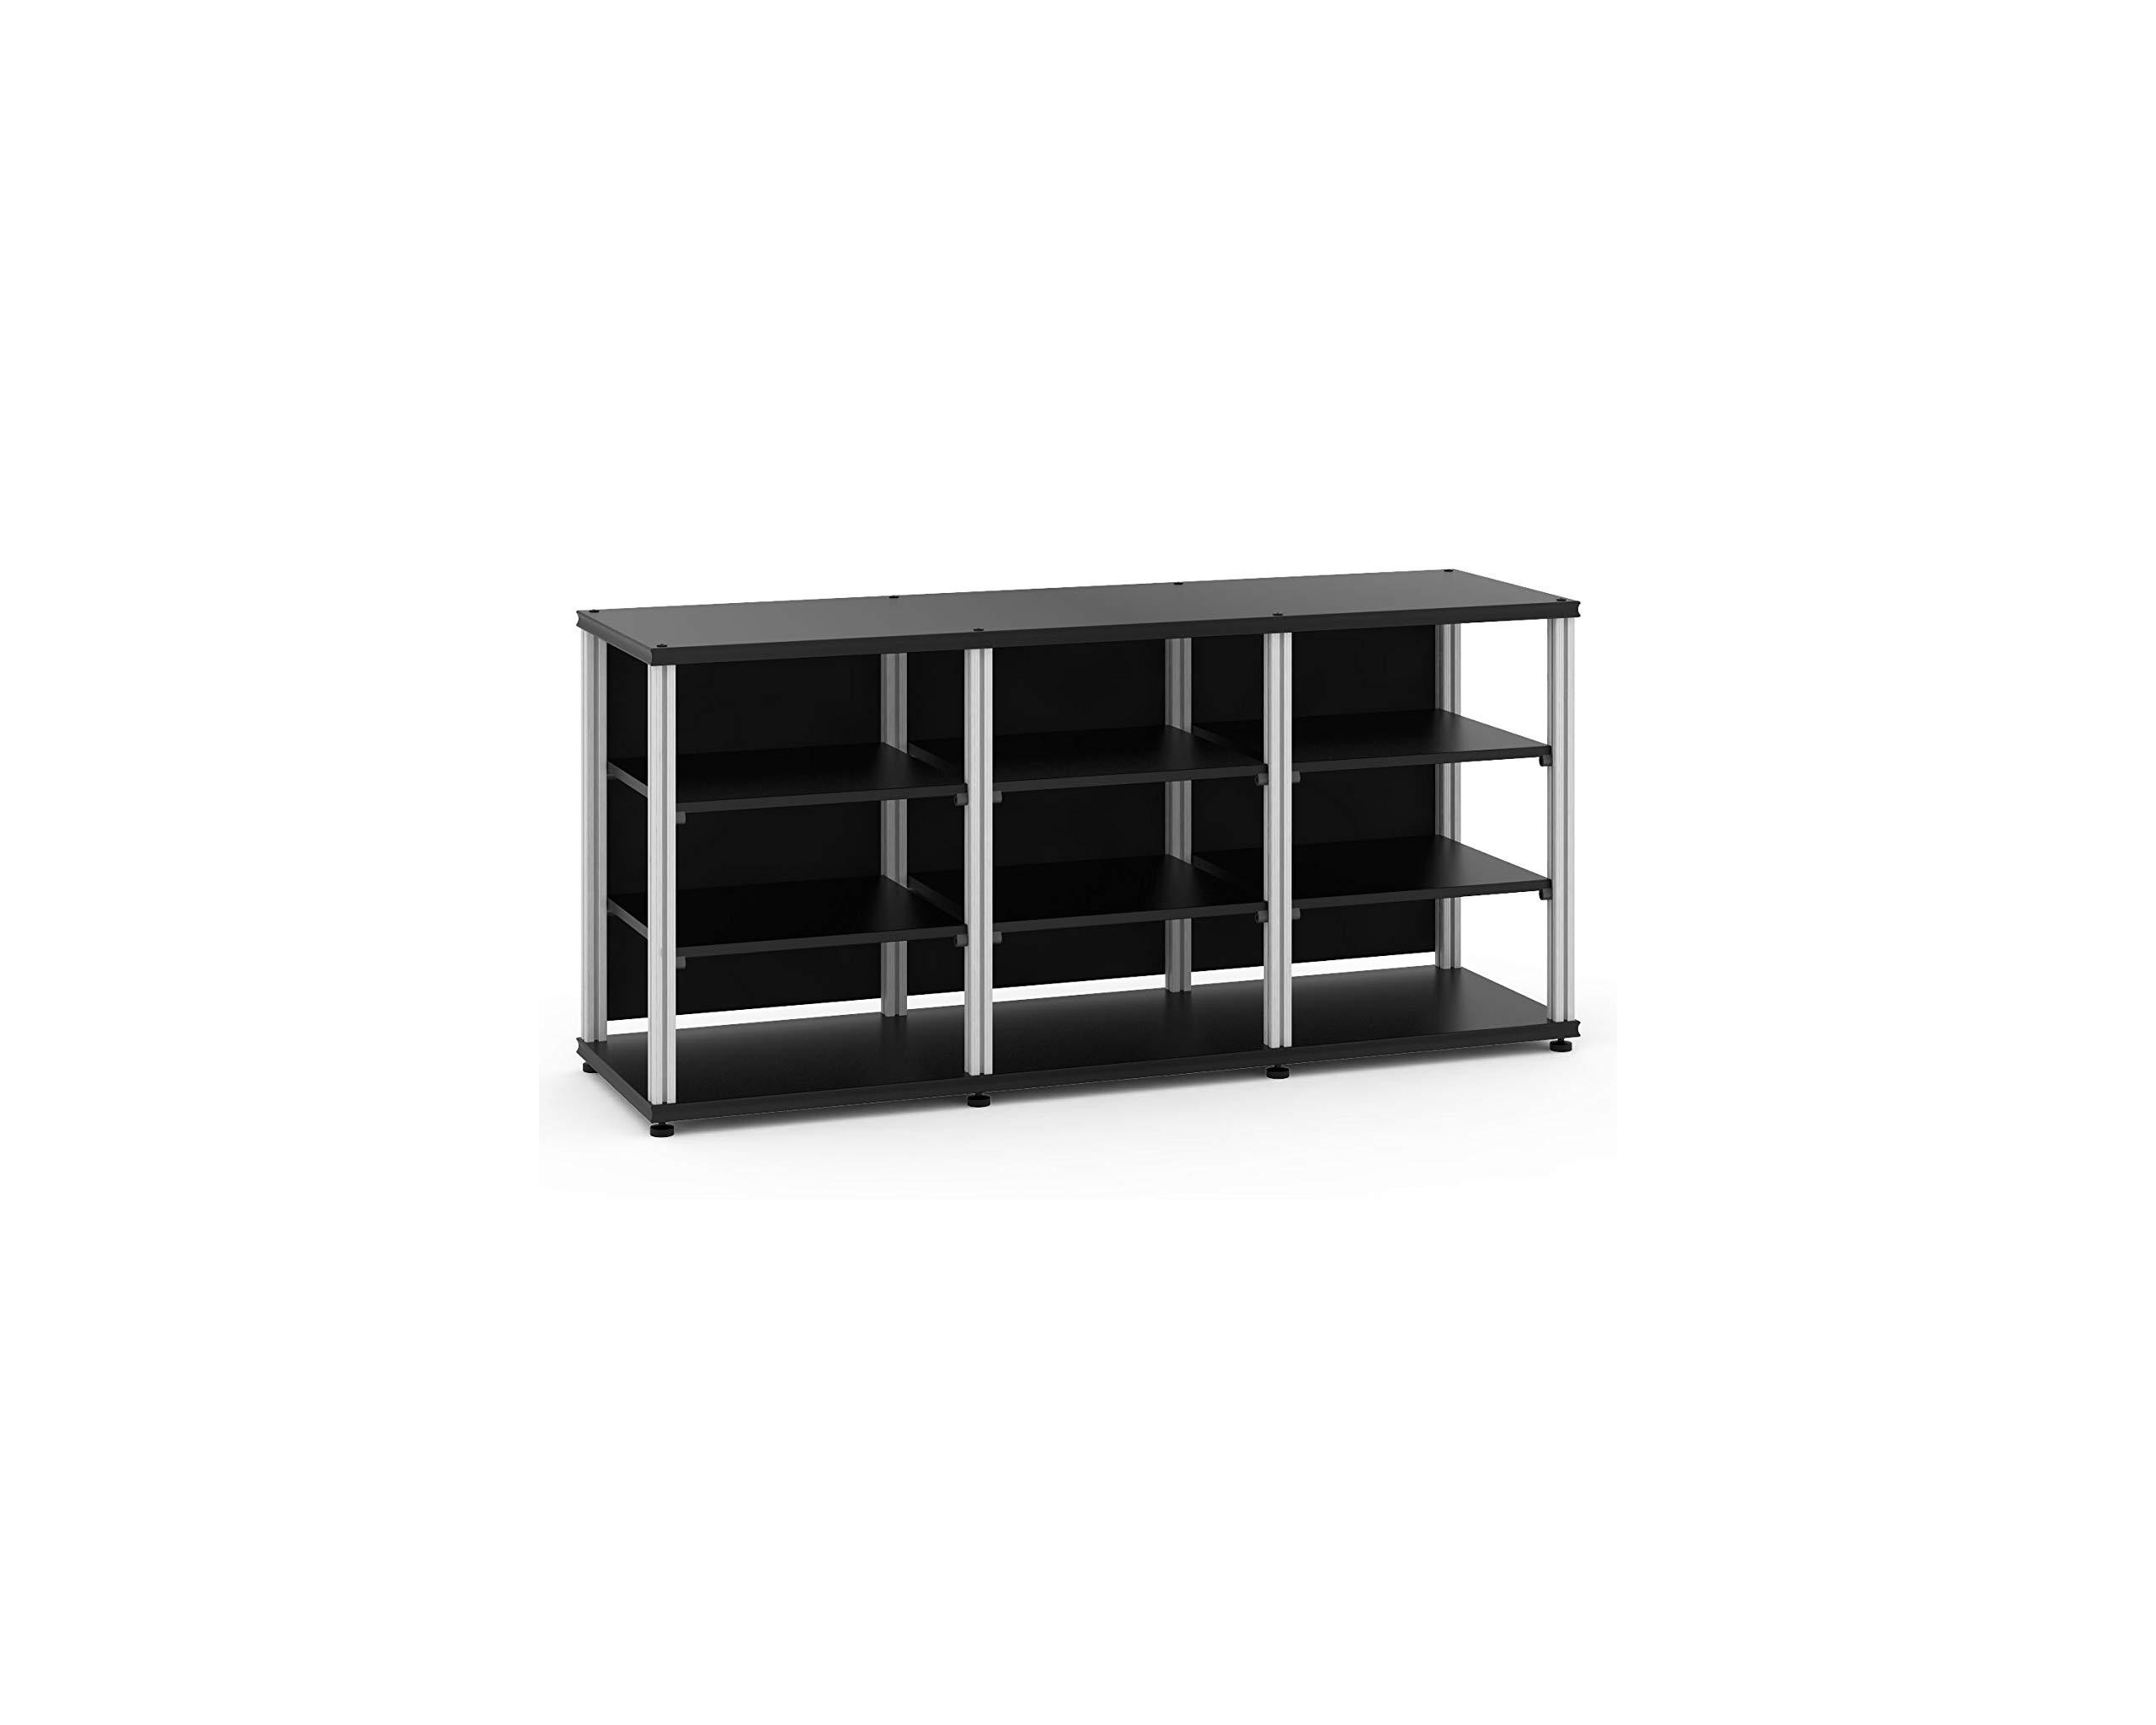 Salamander Synergy Triple 30 - Core Module (Black/Aluminum) Triple AV Cabinet by Salamander